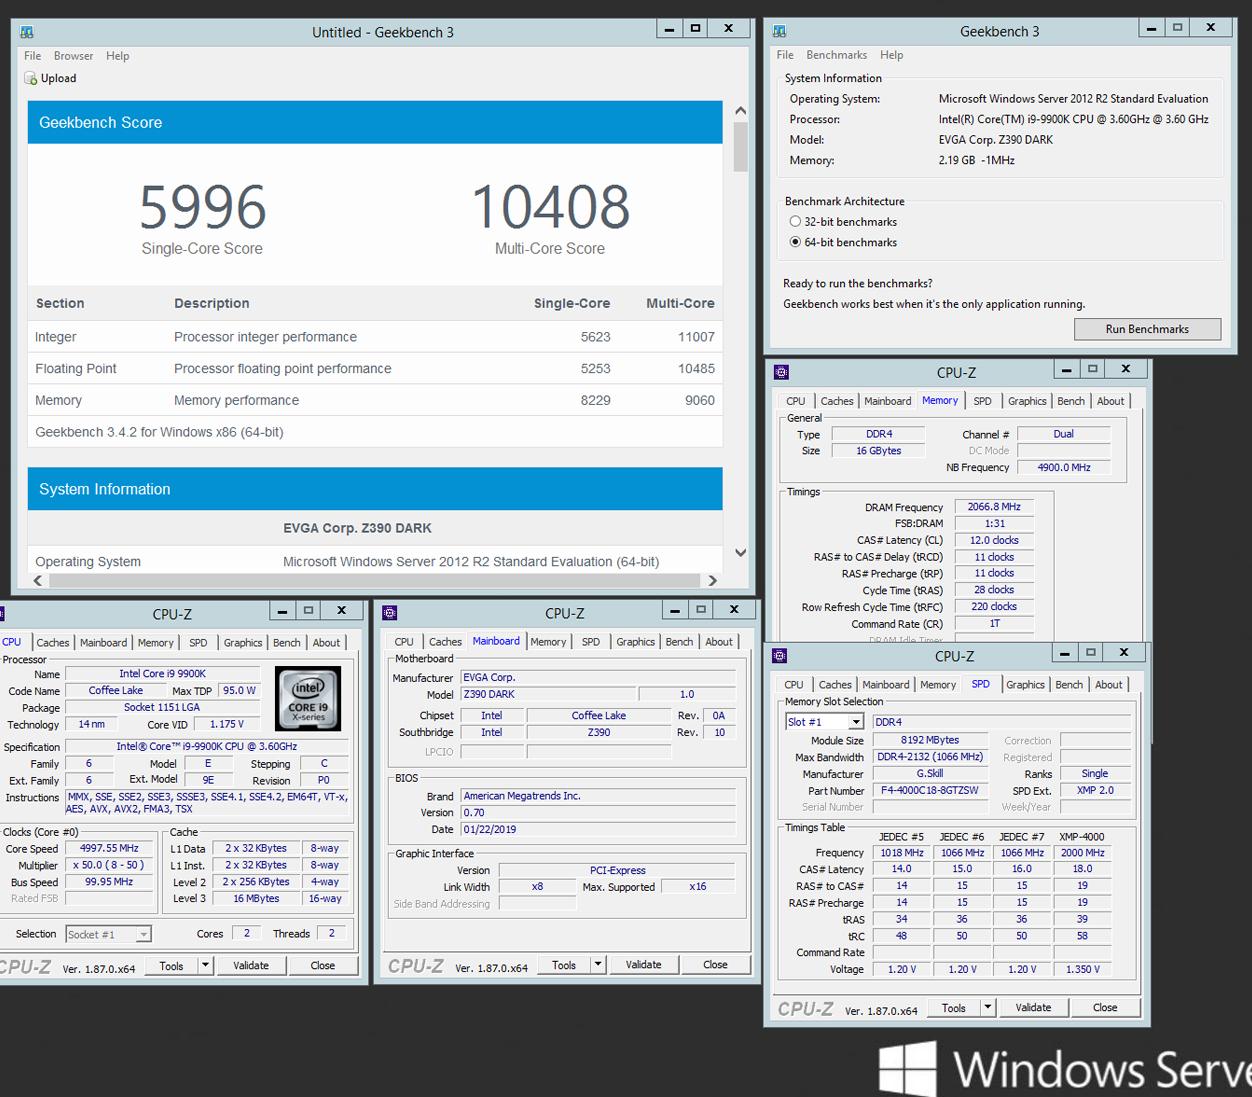 EVGA Z390 DARK and B-Die based low latency memory overclocking